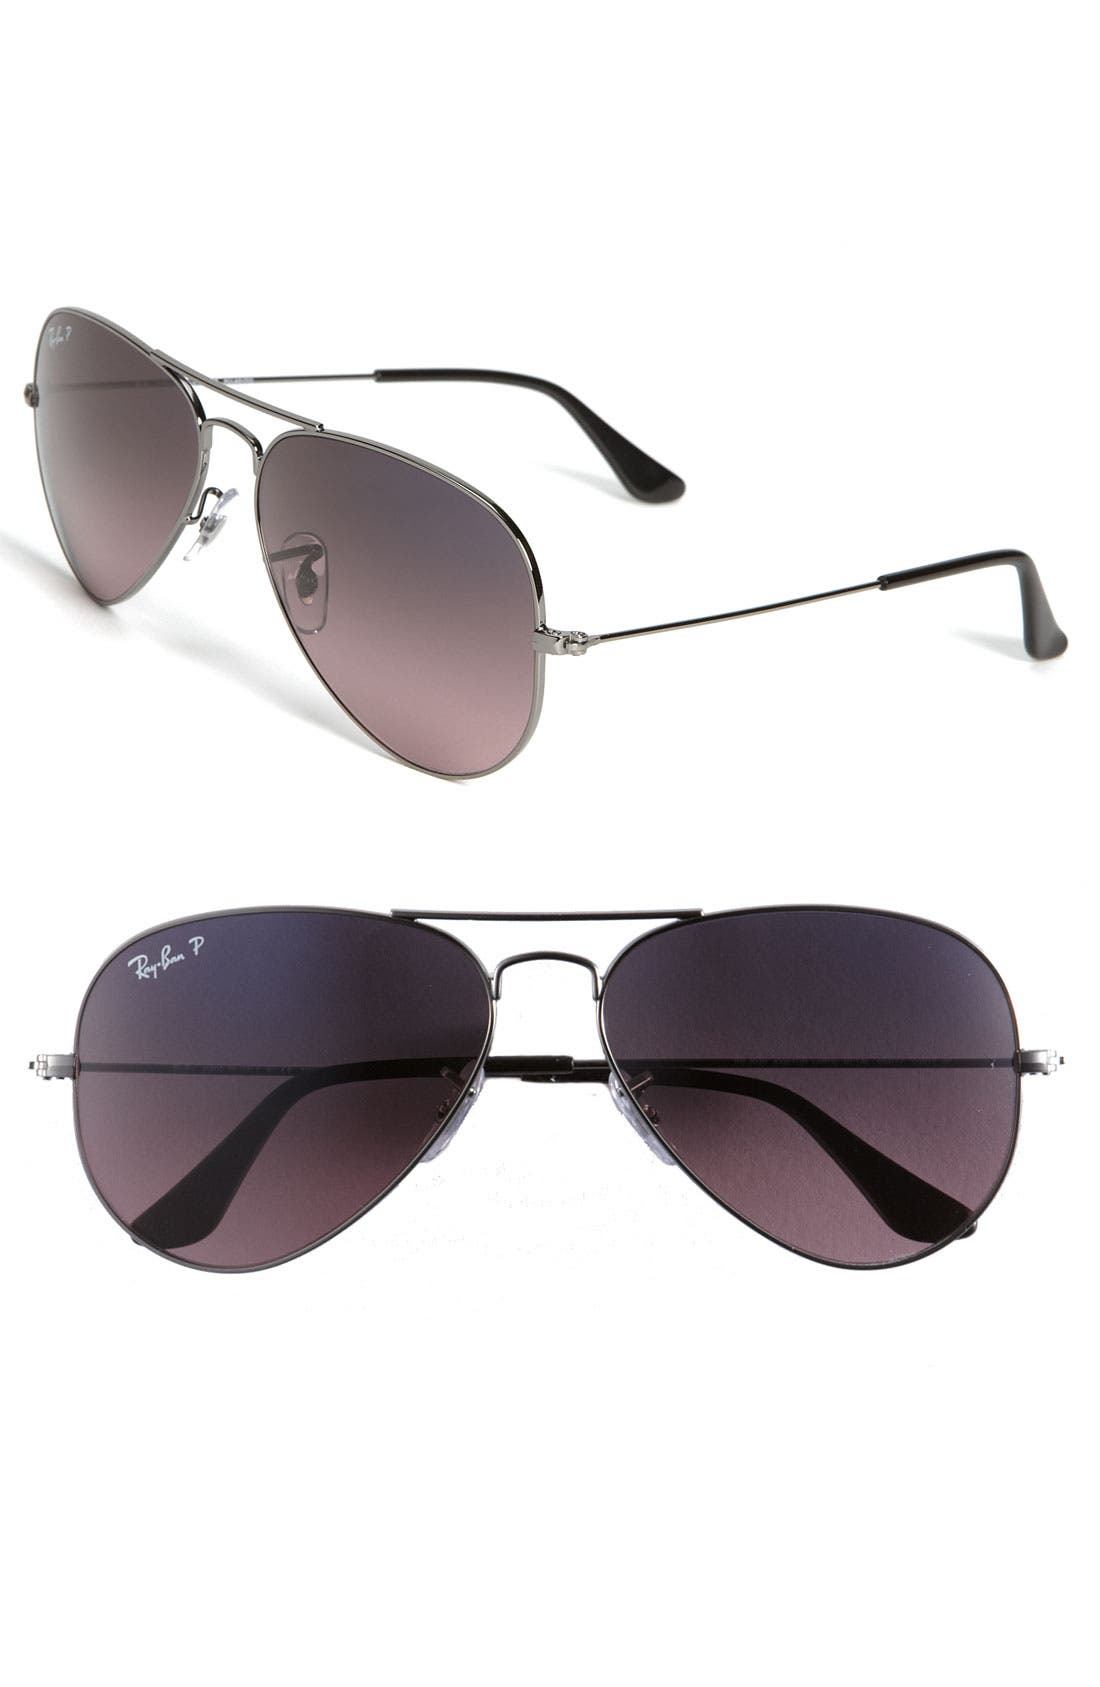 Main Image - Ray-Ban Original Aviator 58mm Polarized Sunglasses